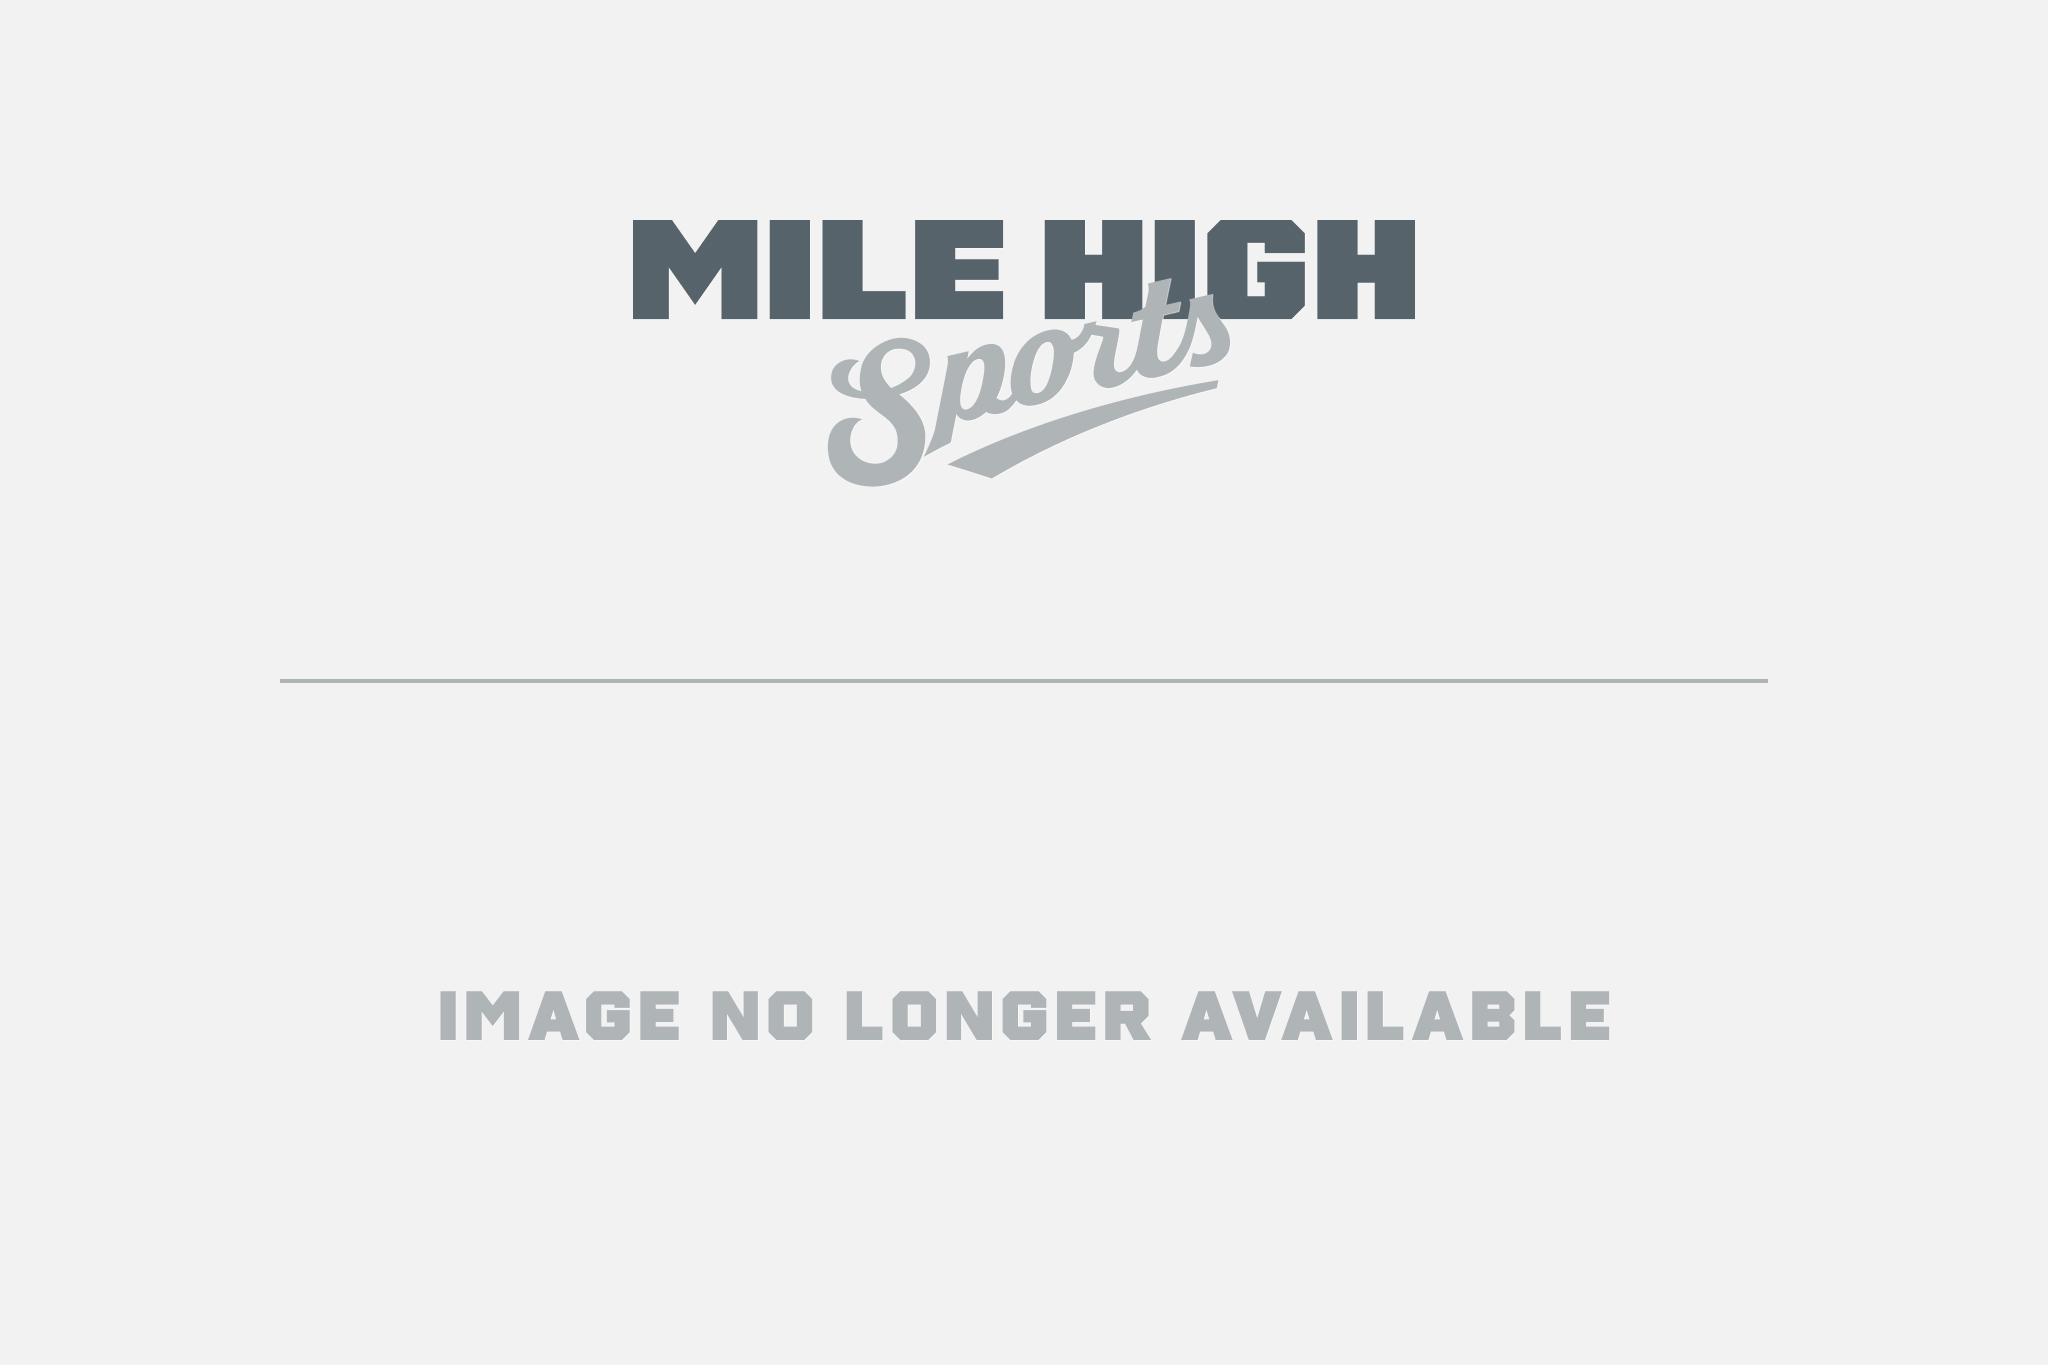 Credit: http://grfx.cstv.com/photos/schools/denv/sports/m-hockey/auto_widestory/12497997.jpeg